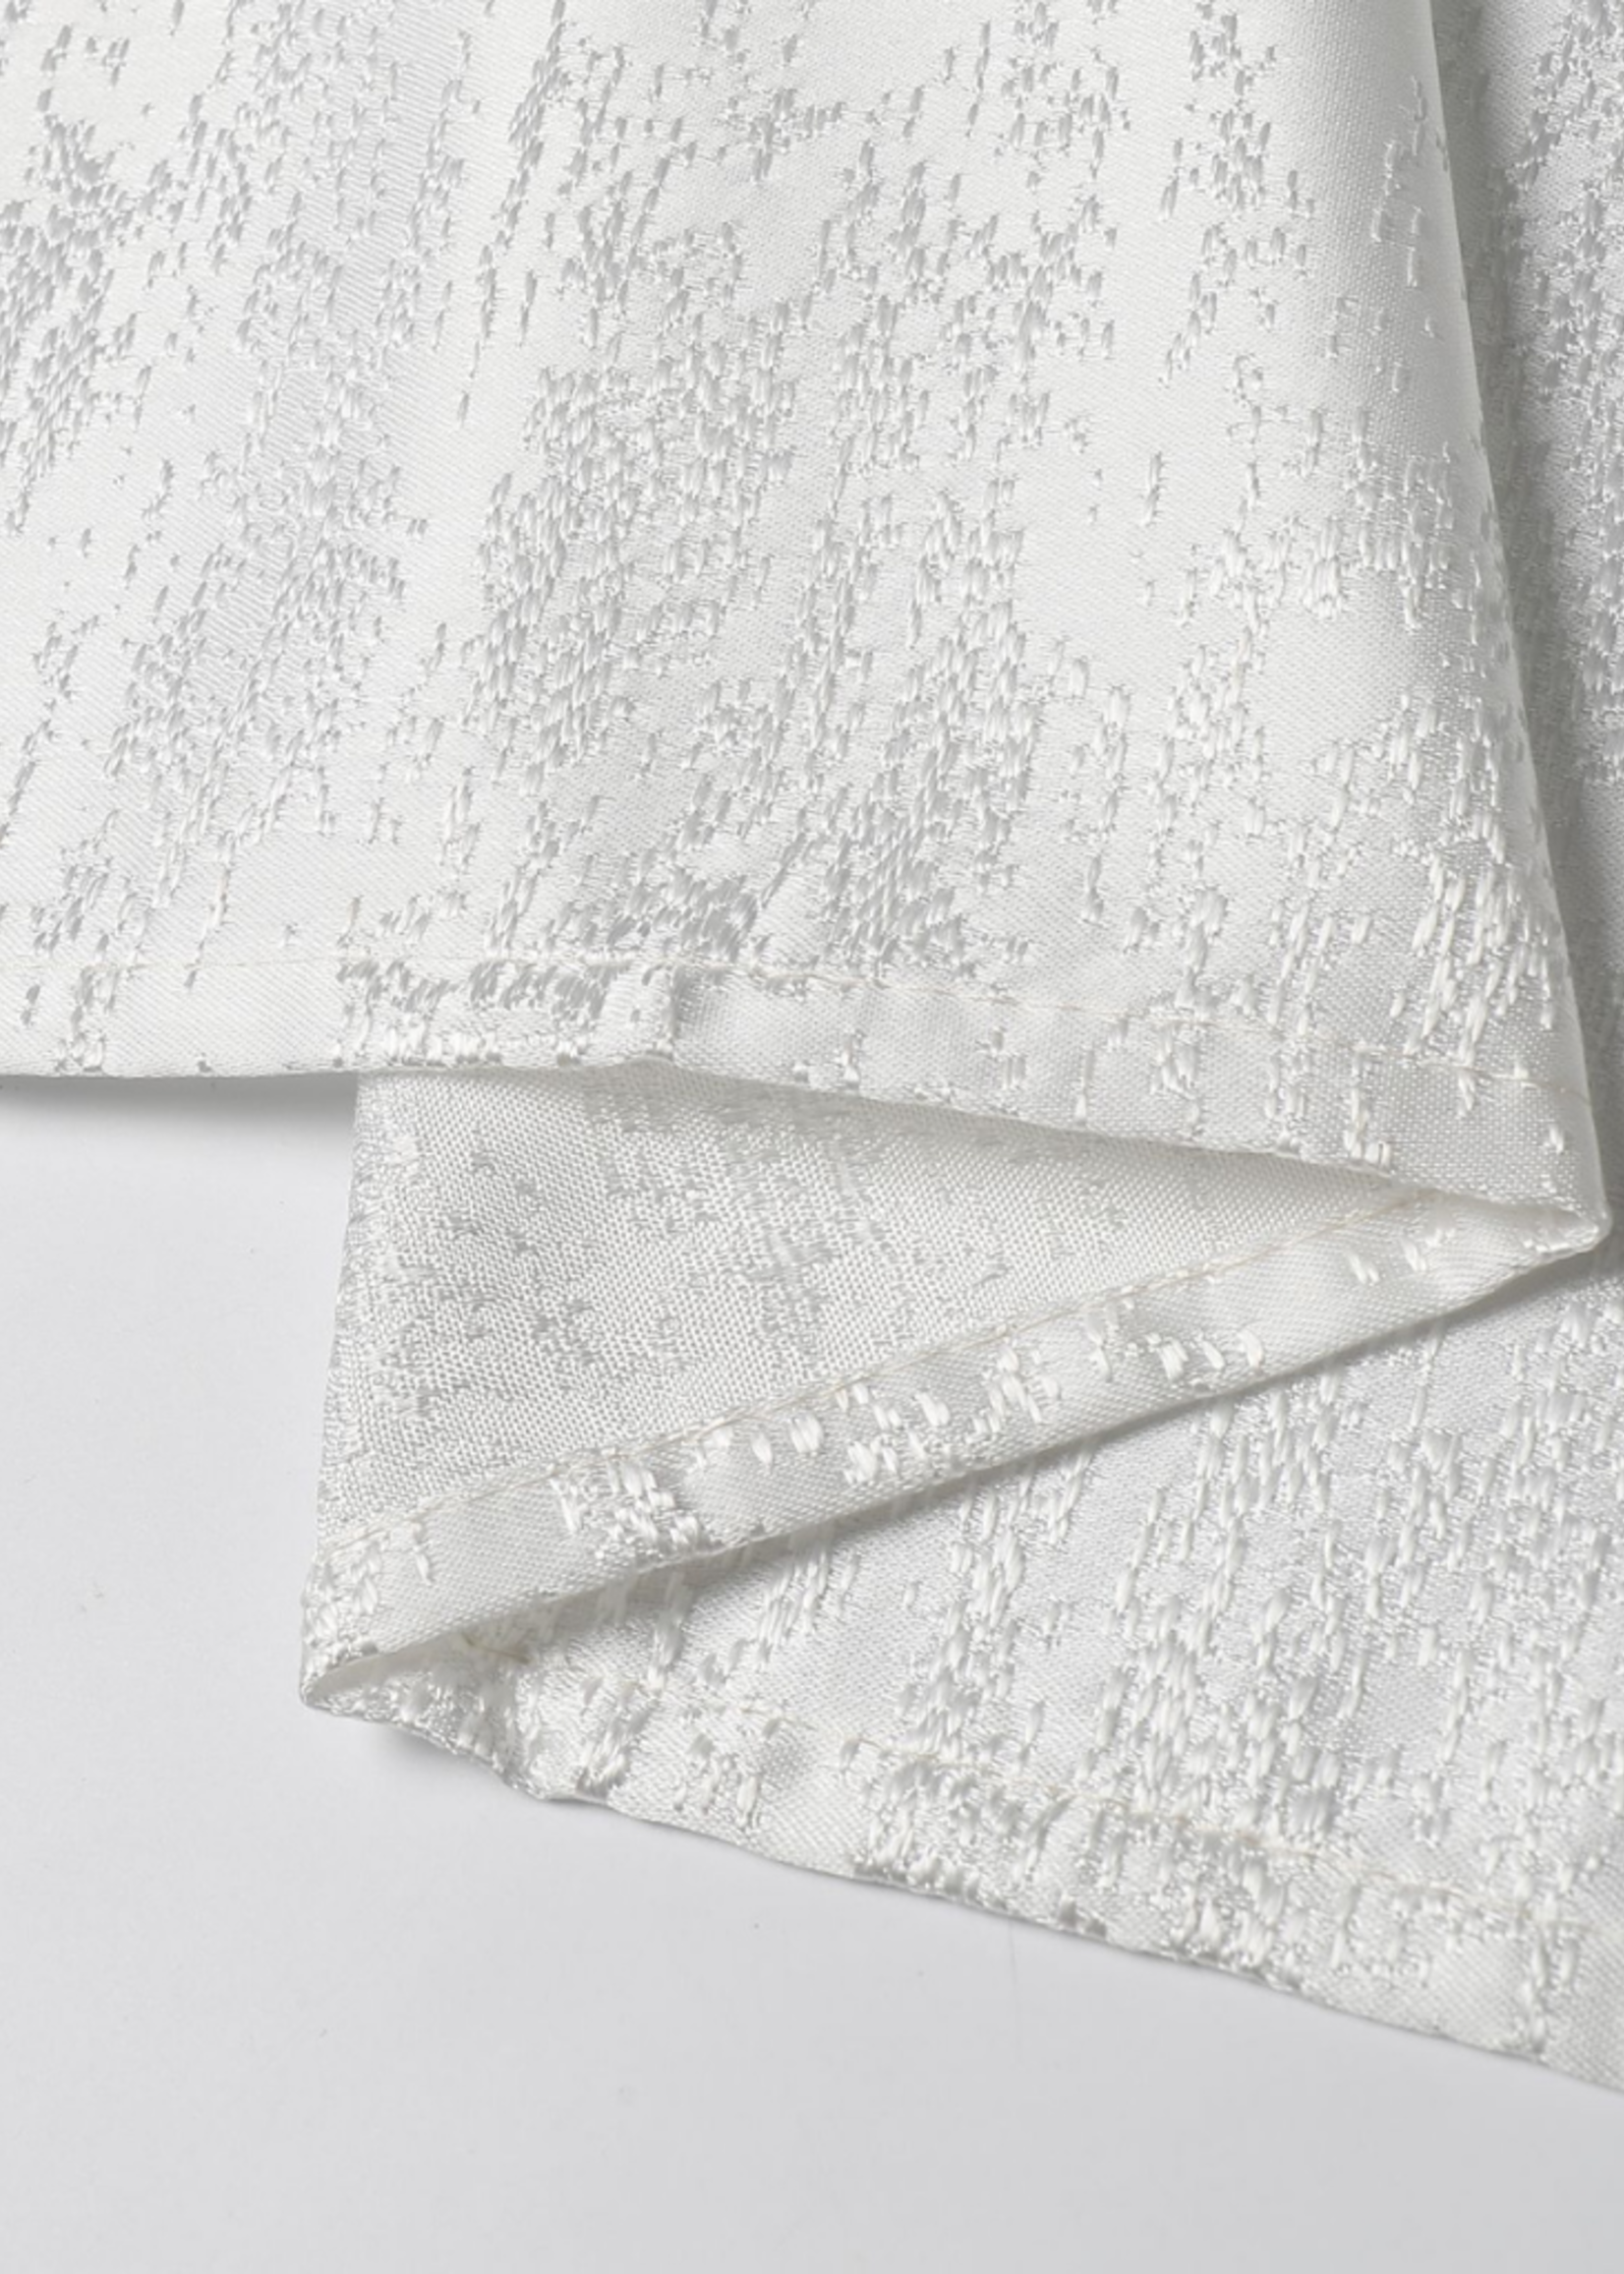 Jacquard Off White Tablecloth #TC1324